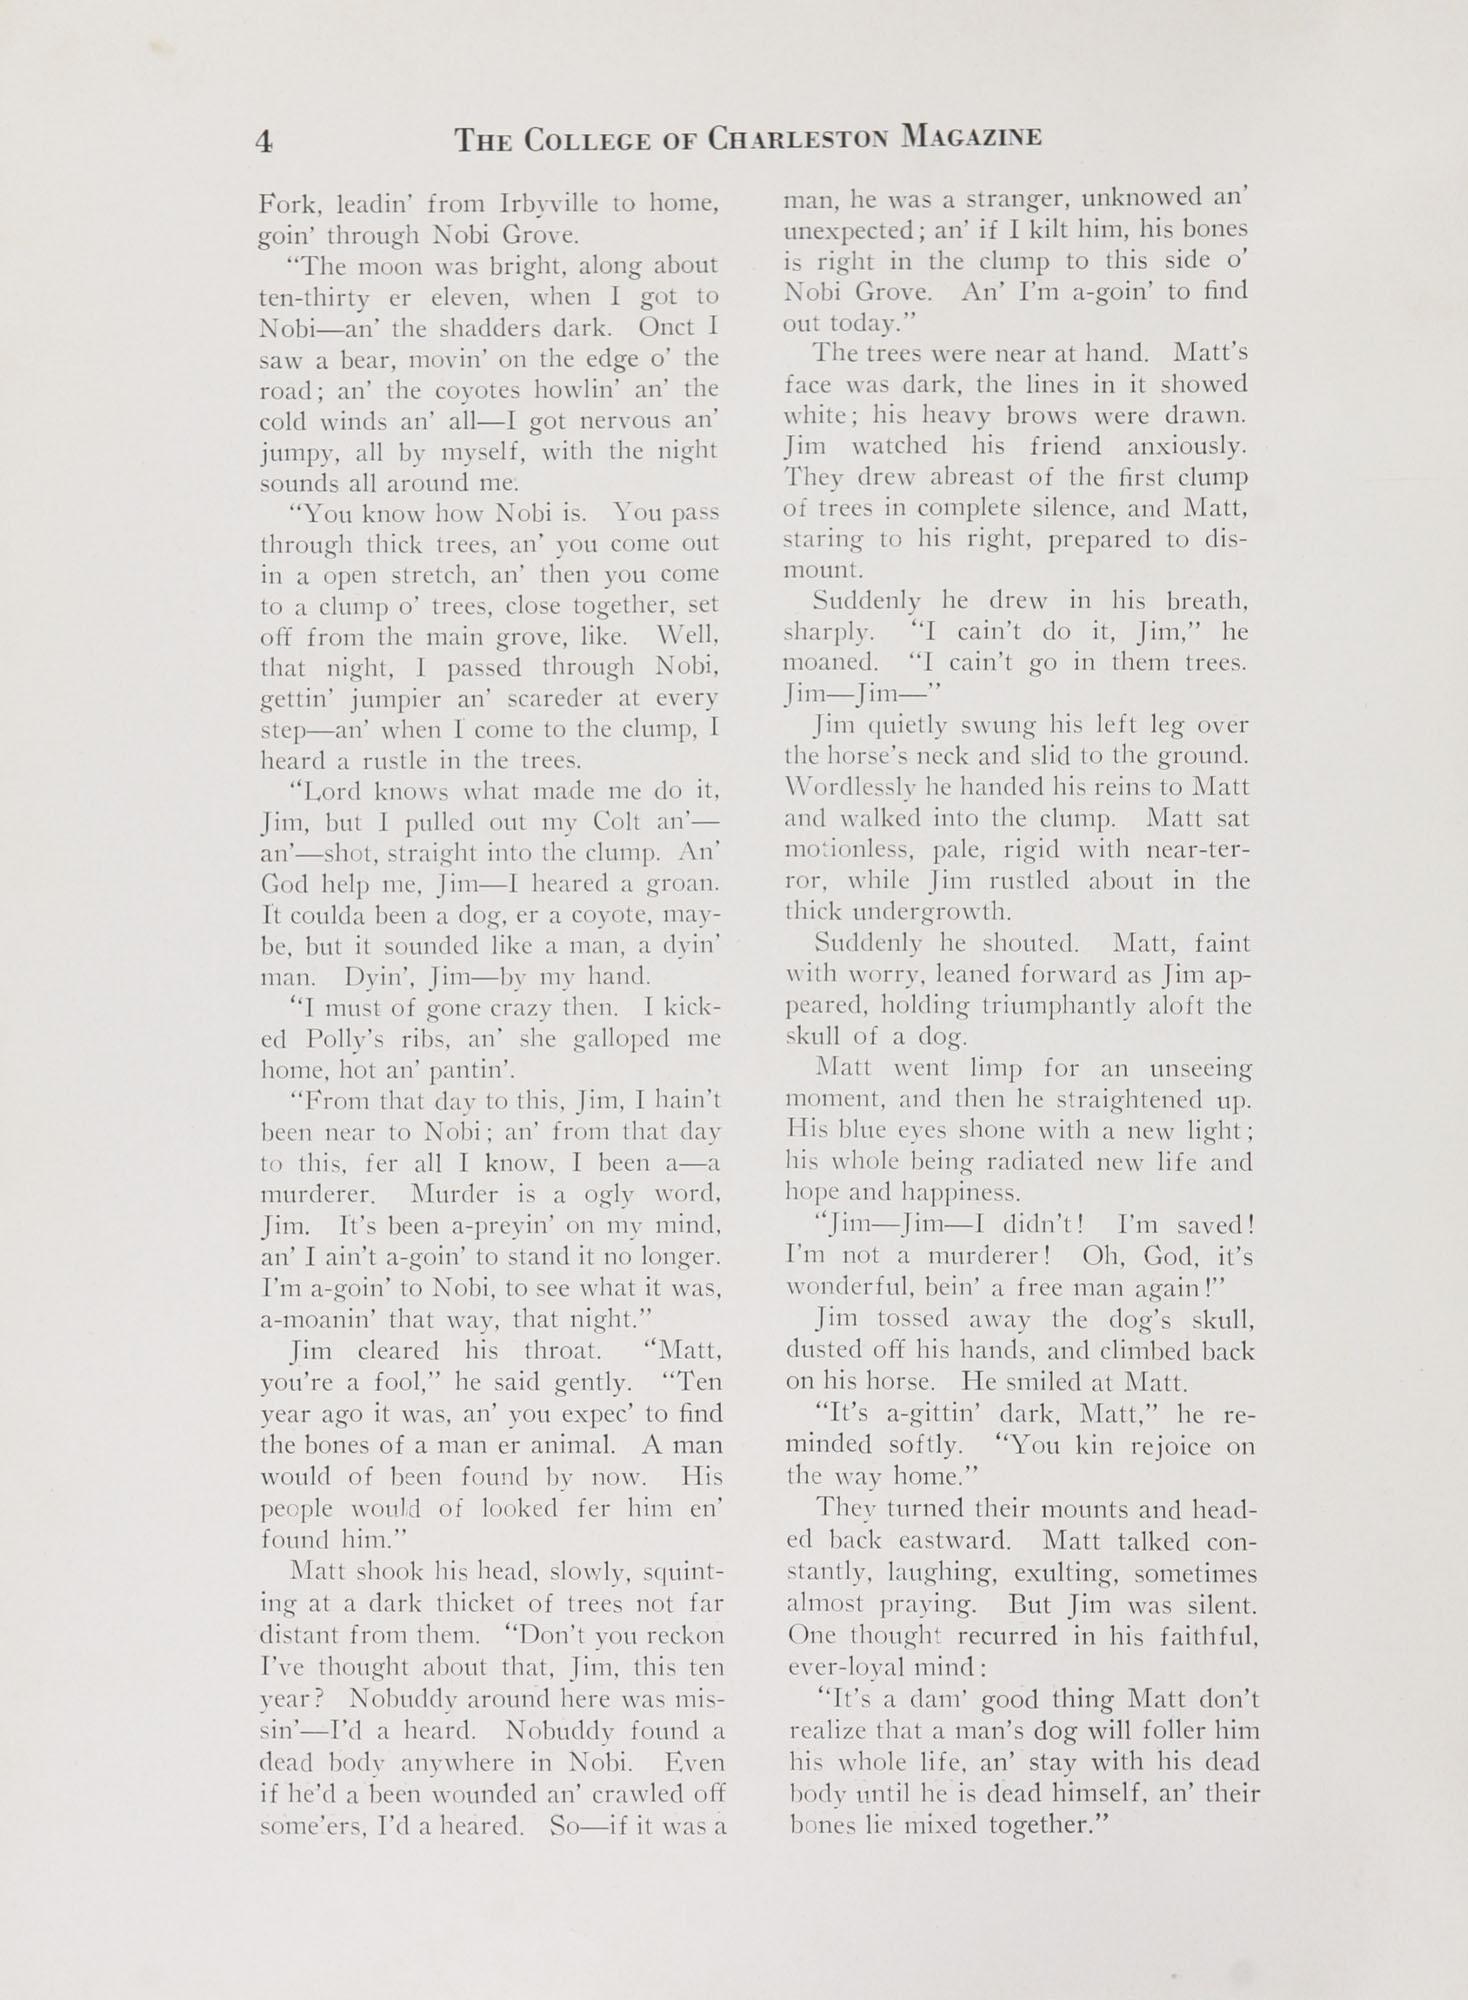 College of Charleston Magazine, 1938-1939, Vol. XXXXII No. 1, page 4